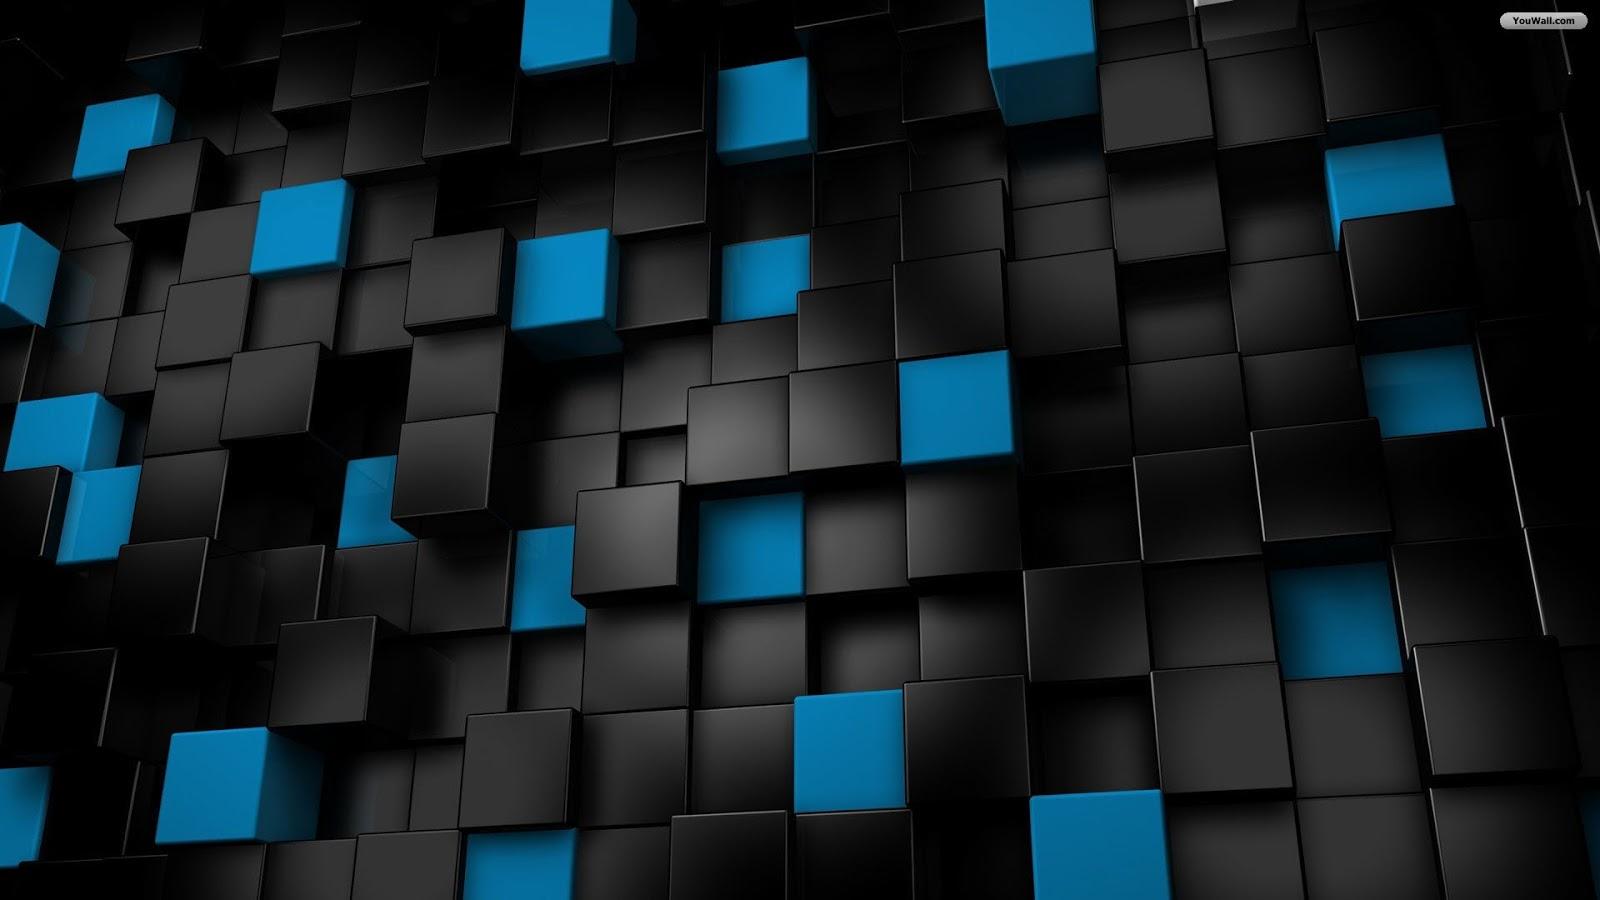 wallpaper hitam 3d, wallpaper ubin 3d hitam, wallpaper 3d putih hitam, wallpaper desktop 3d hitam, wallpaper 3d hitam merah, wallpaper 3d hitam dan biru,